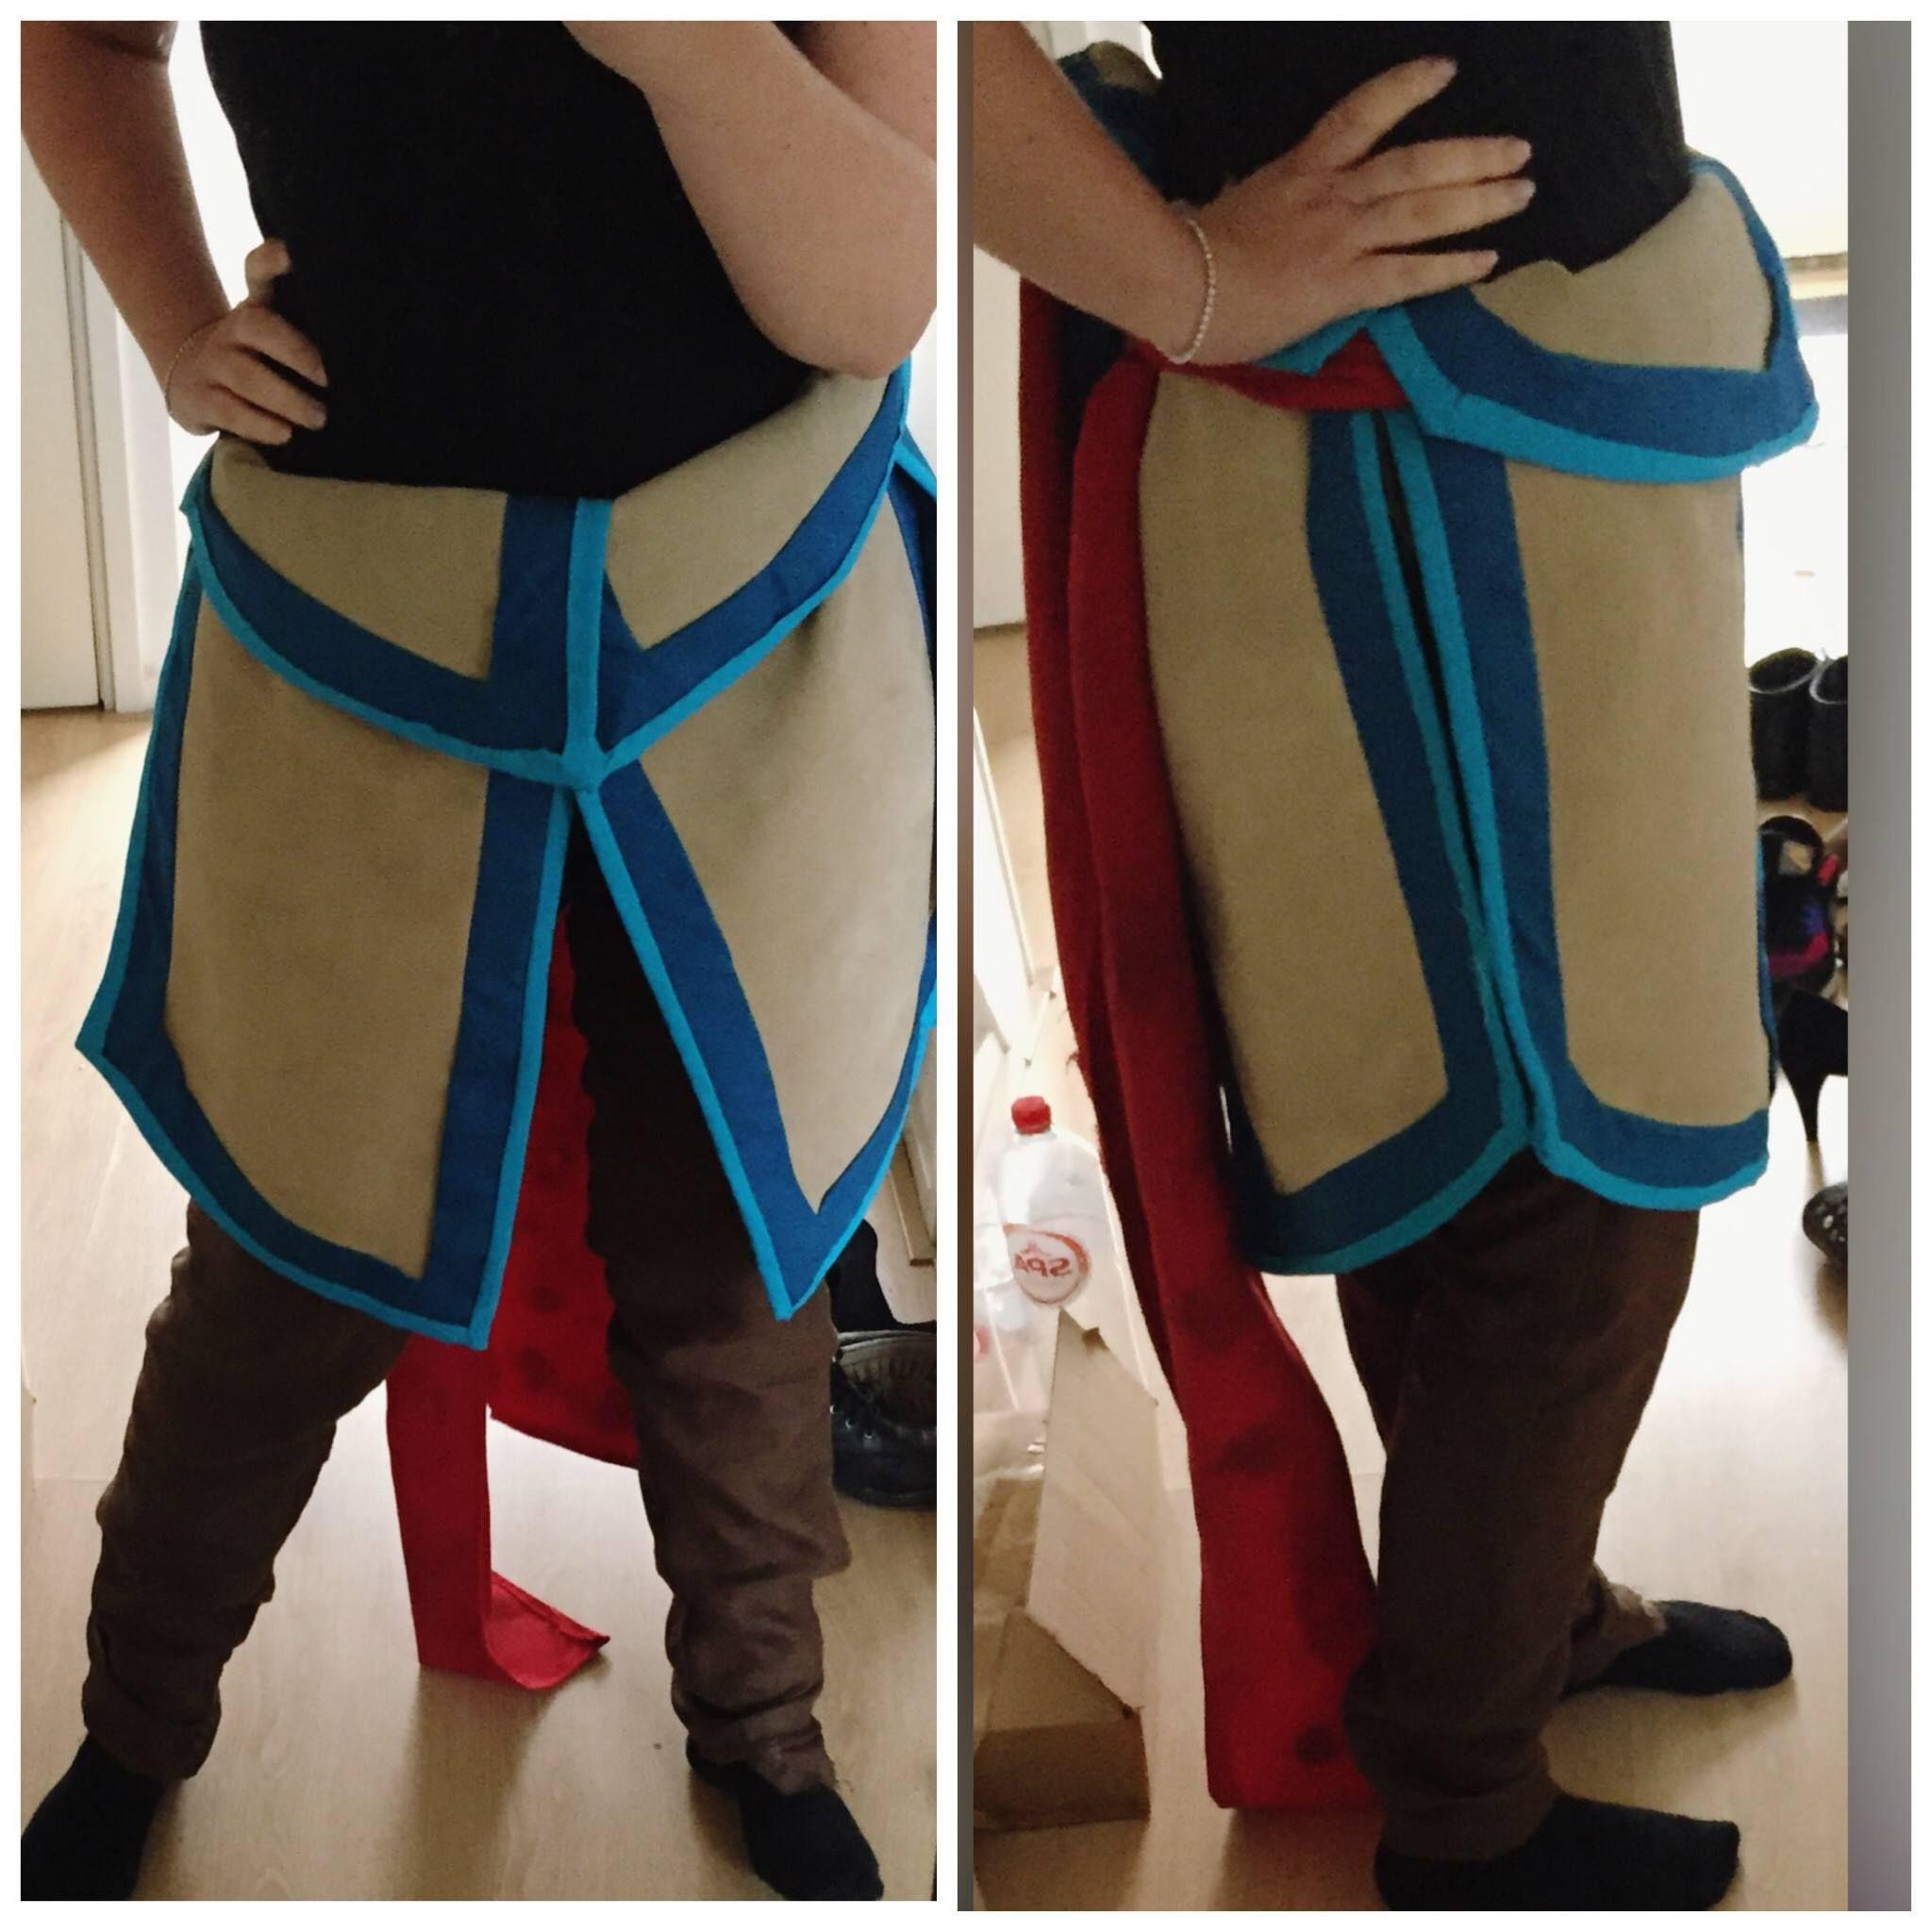 Aloy skirt tutorial  Part 1: Flaps!